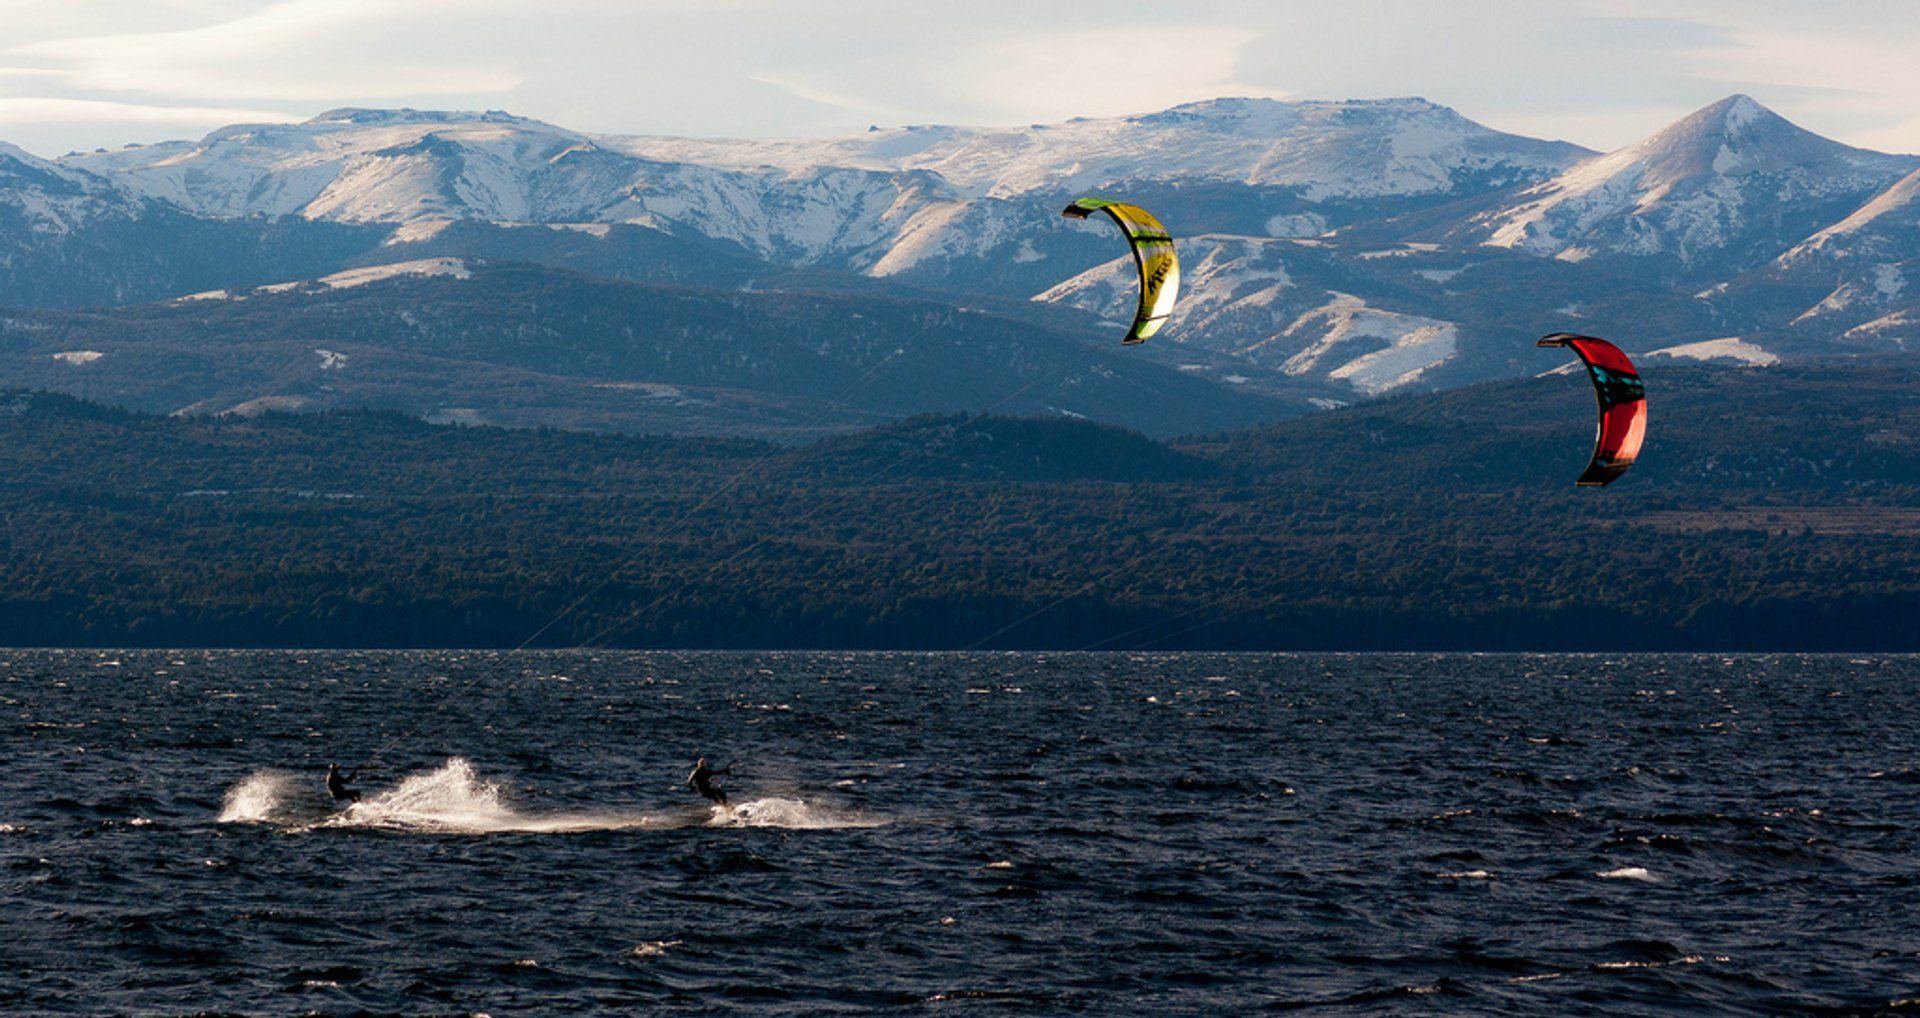 Kitesurfing on Nahuel Huapi in Argentina 2020 - Best Time